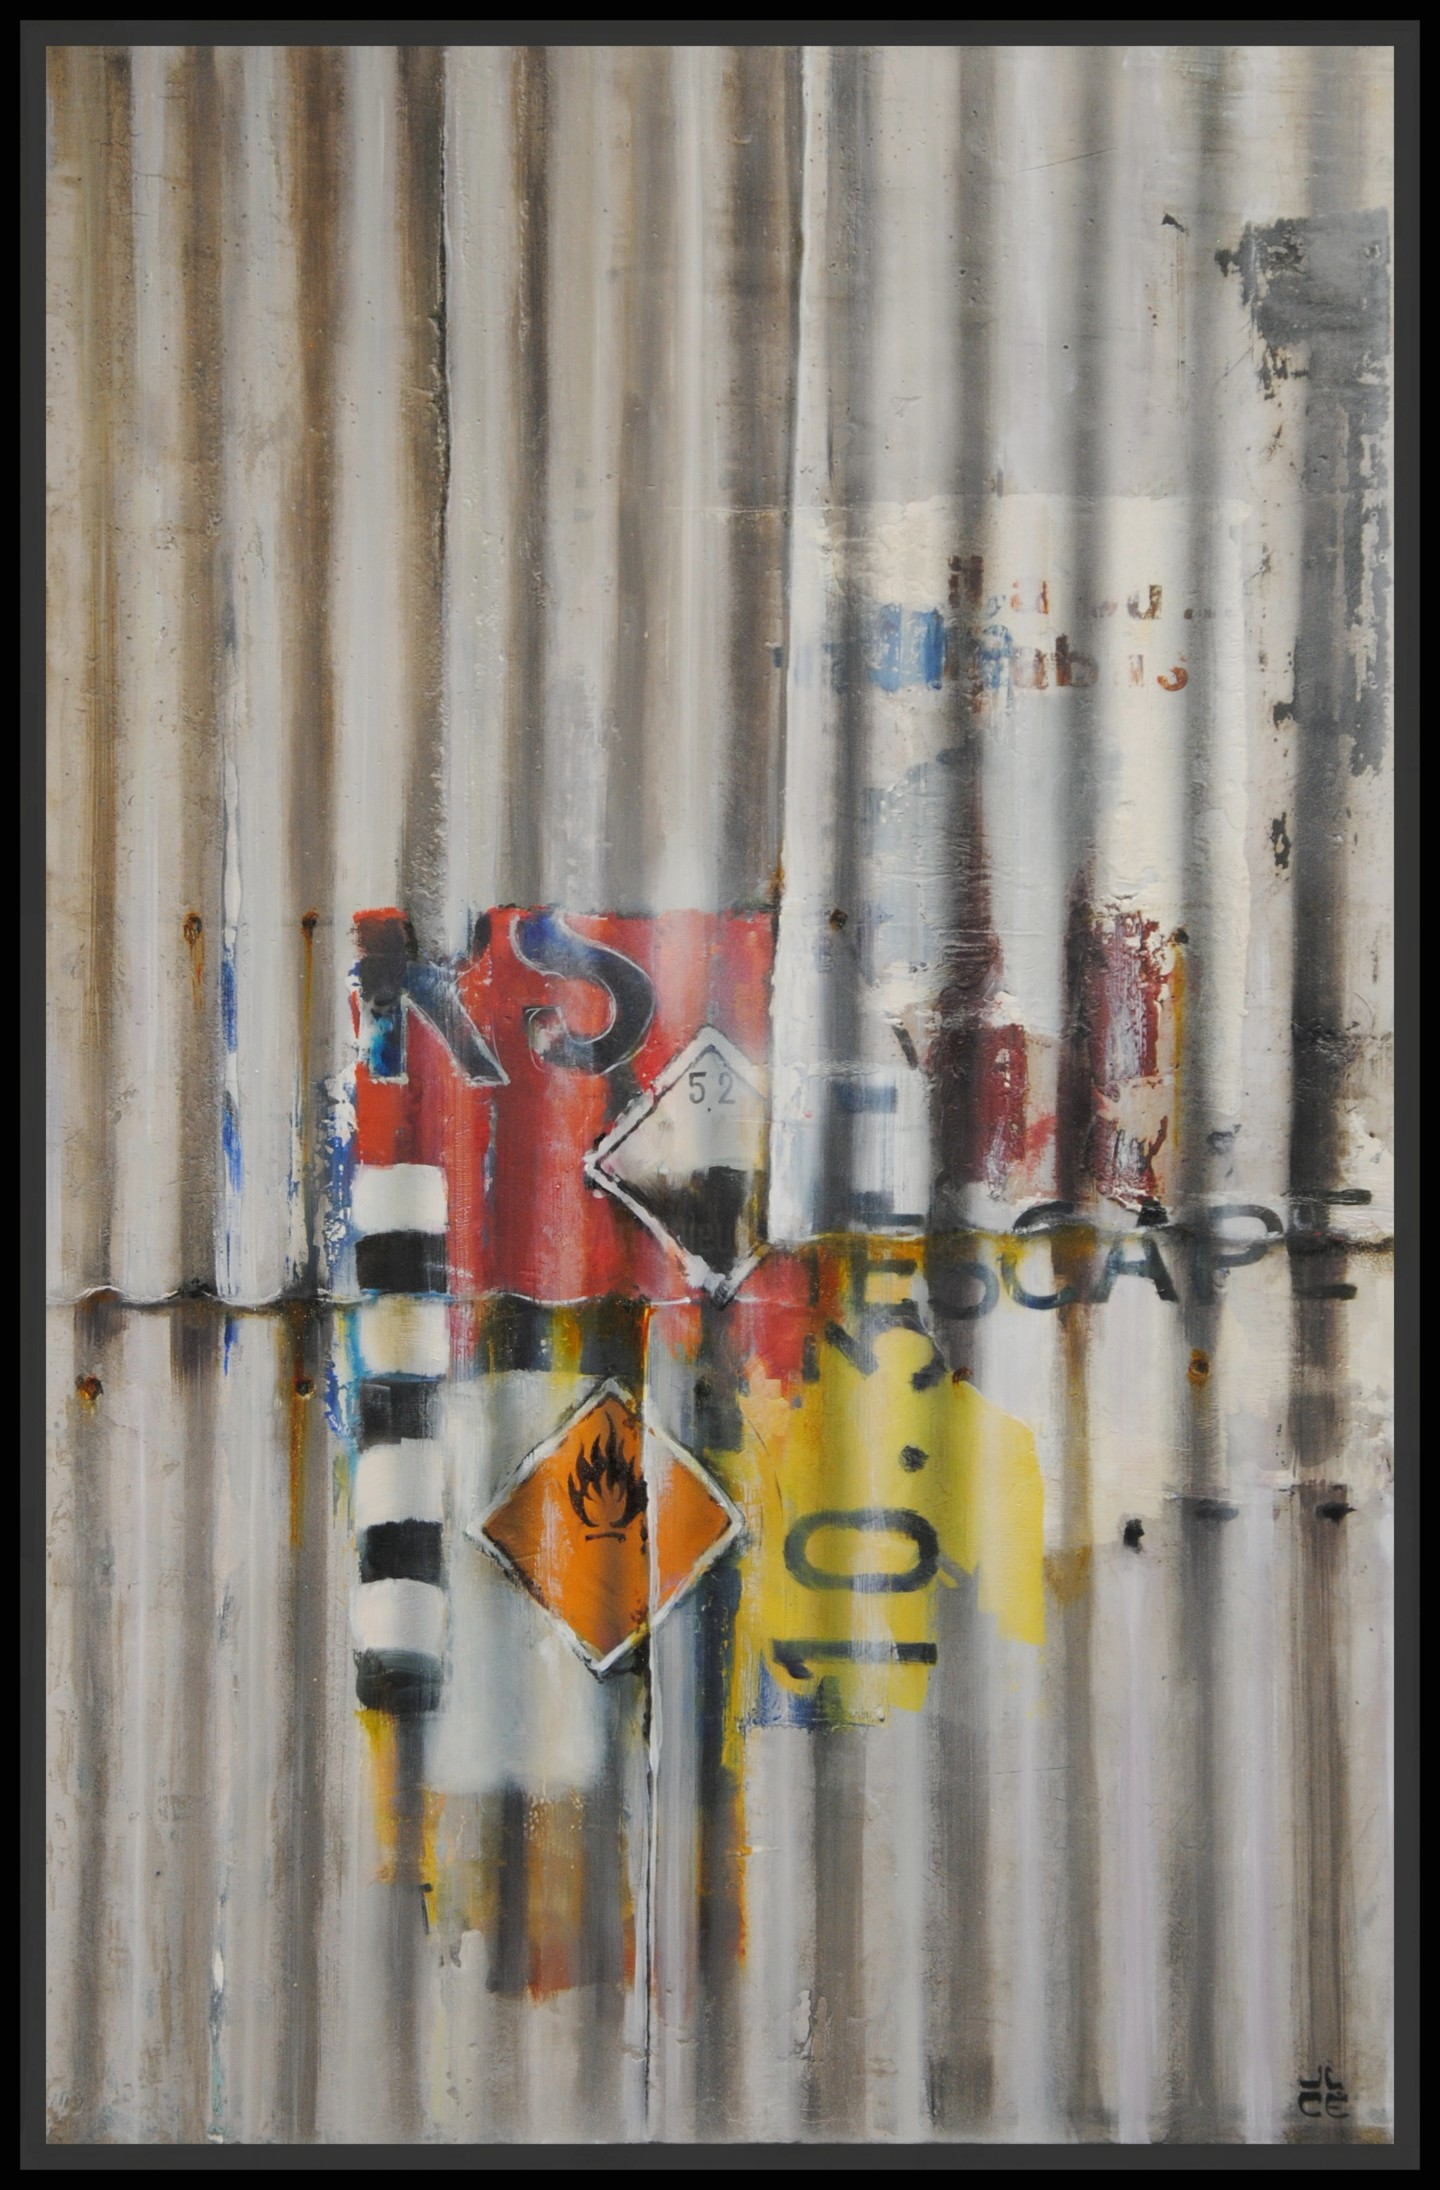 Jicé - Rust Art